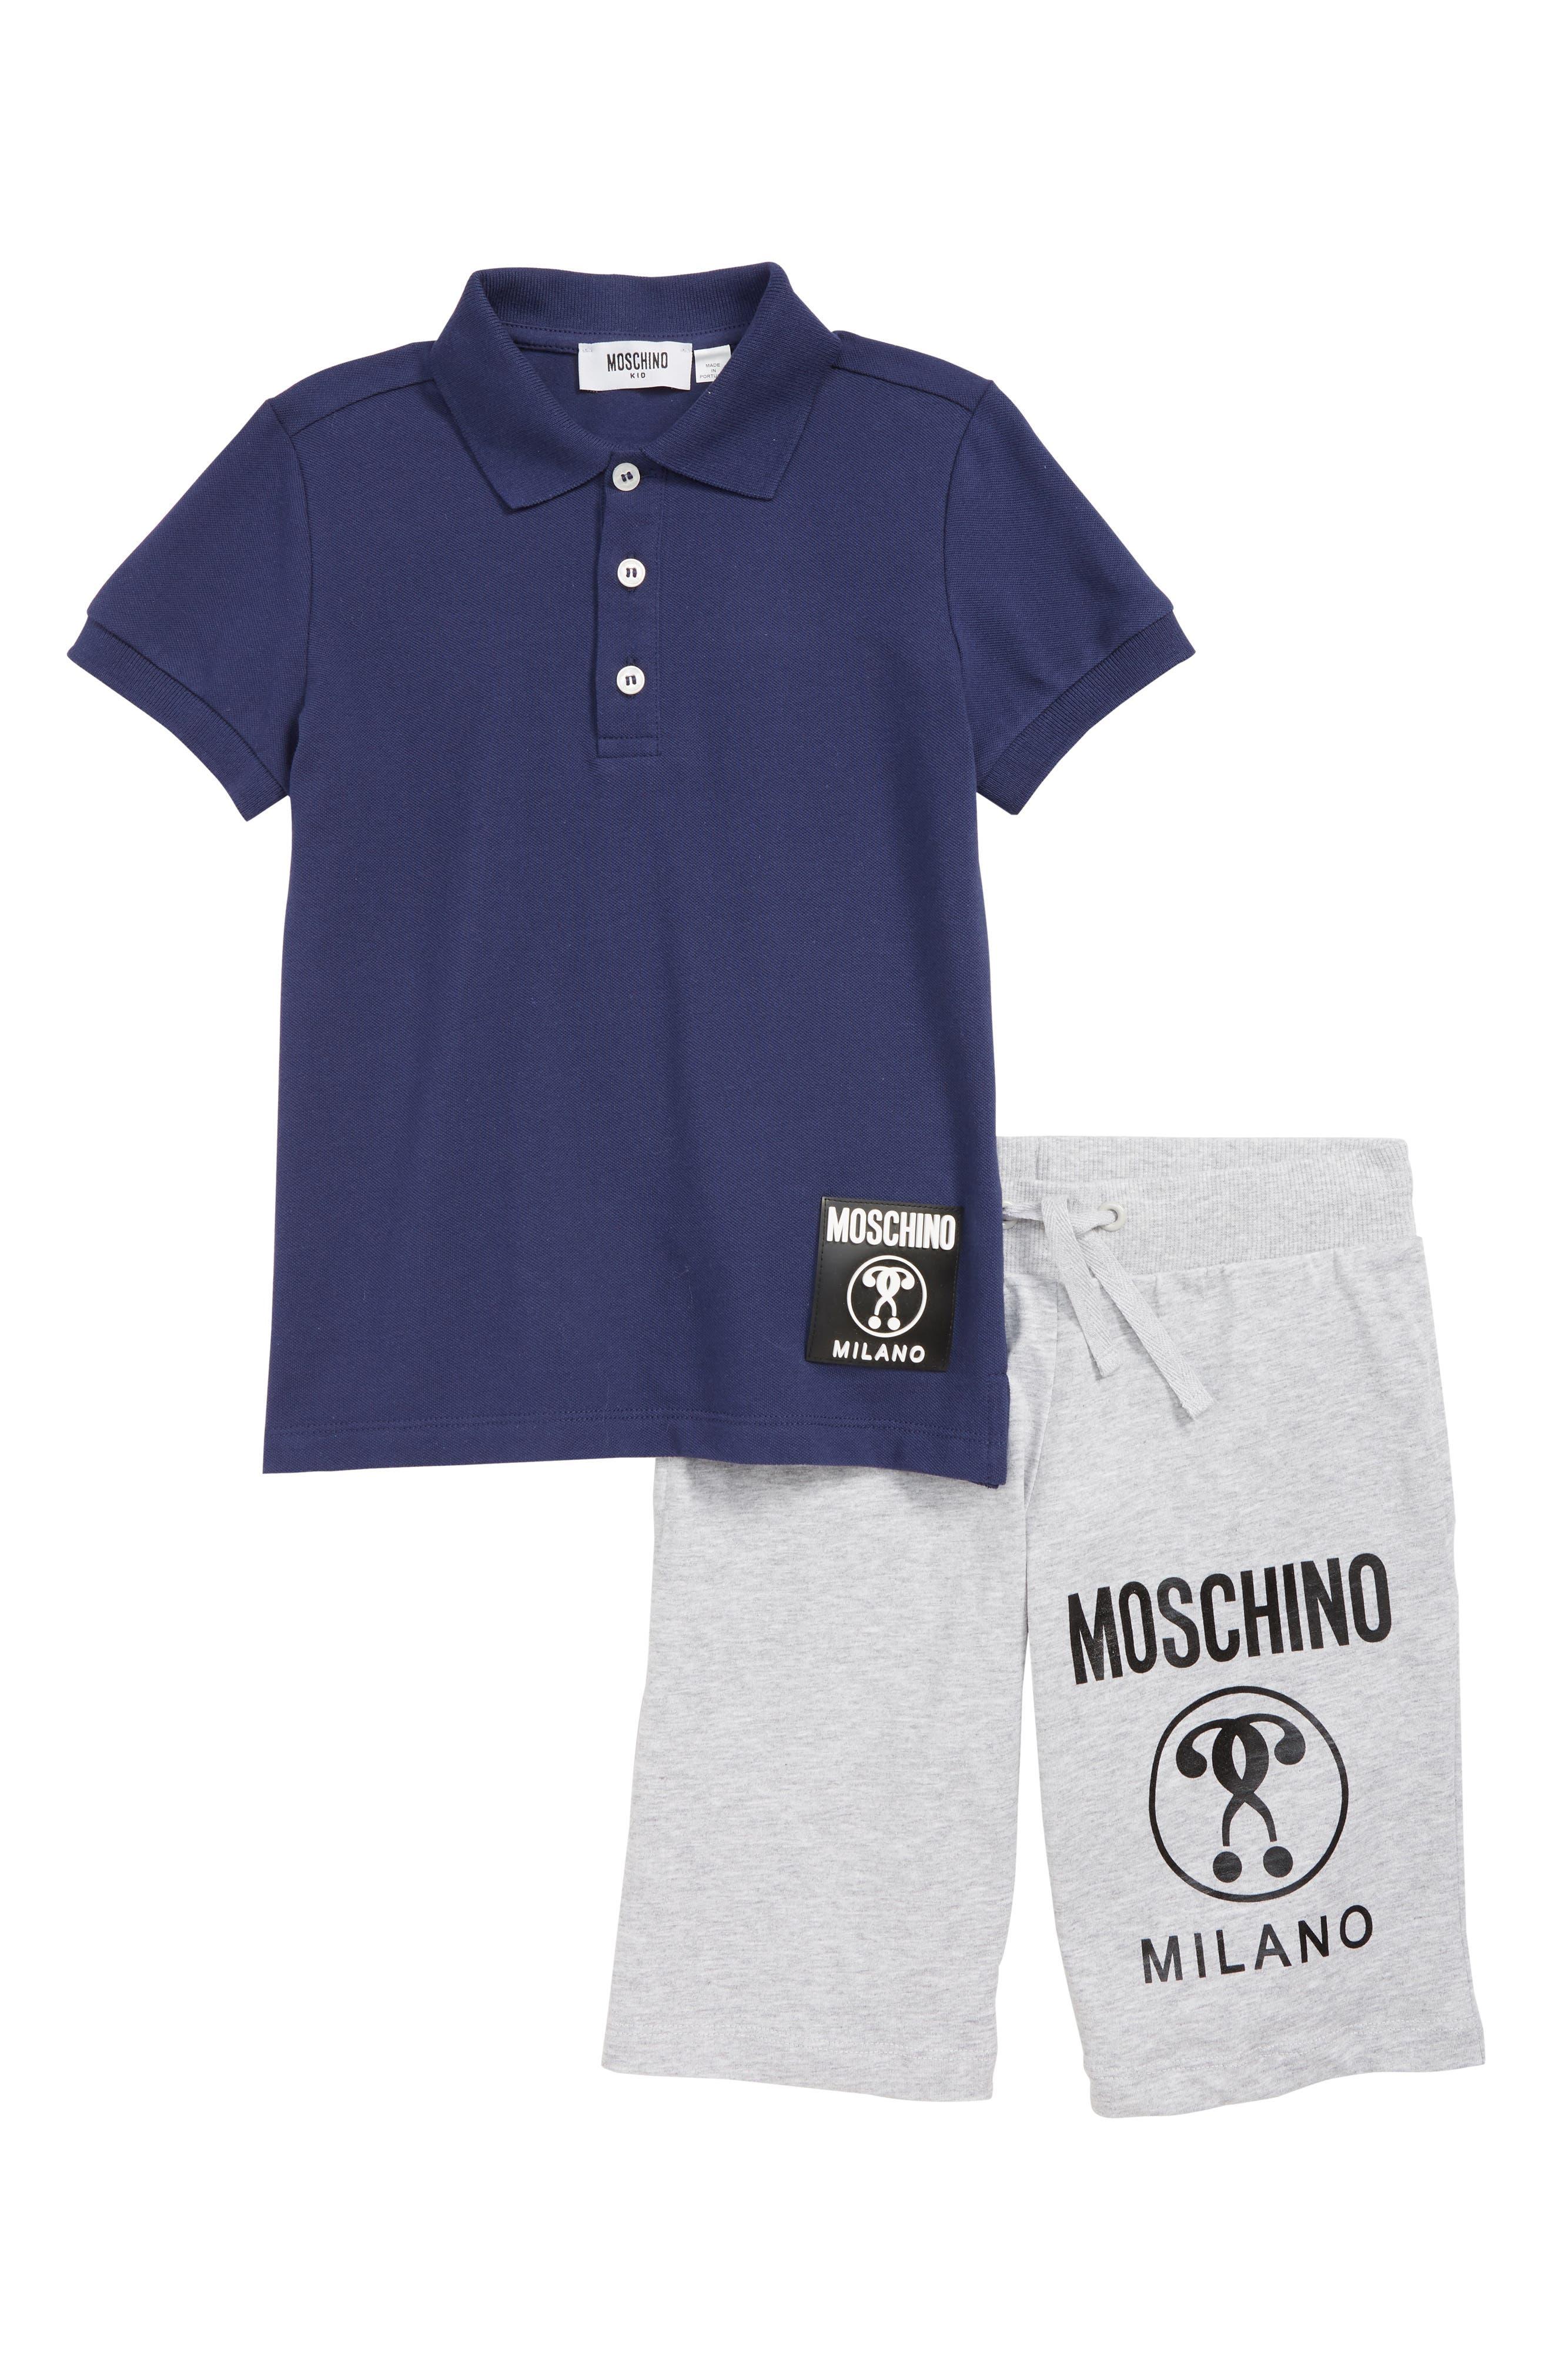 MOSCHINO, Polo & Shorts Set, Main thumbnail 1, color, BLUE/ GREY